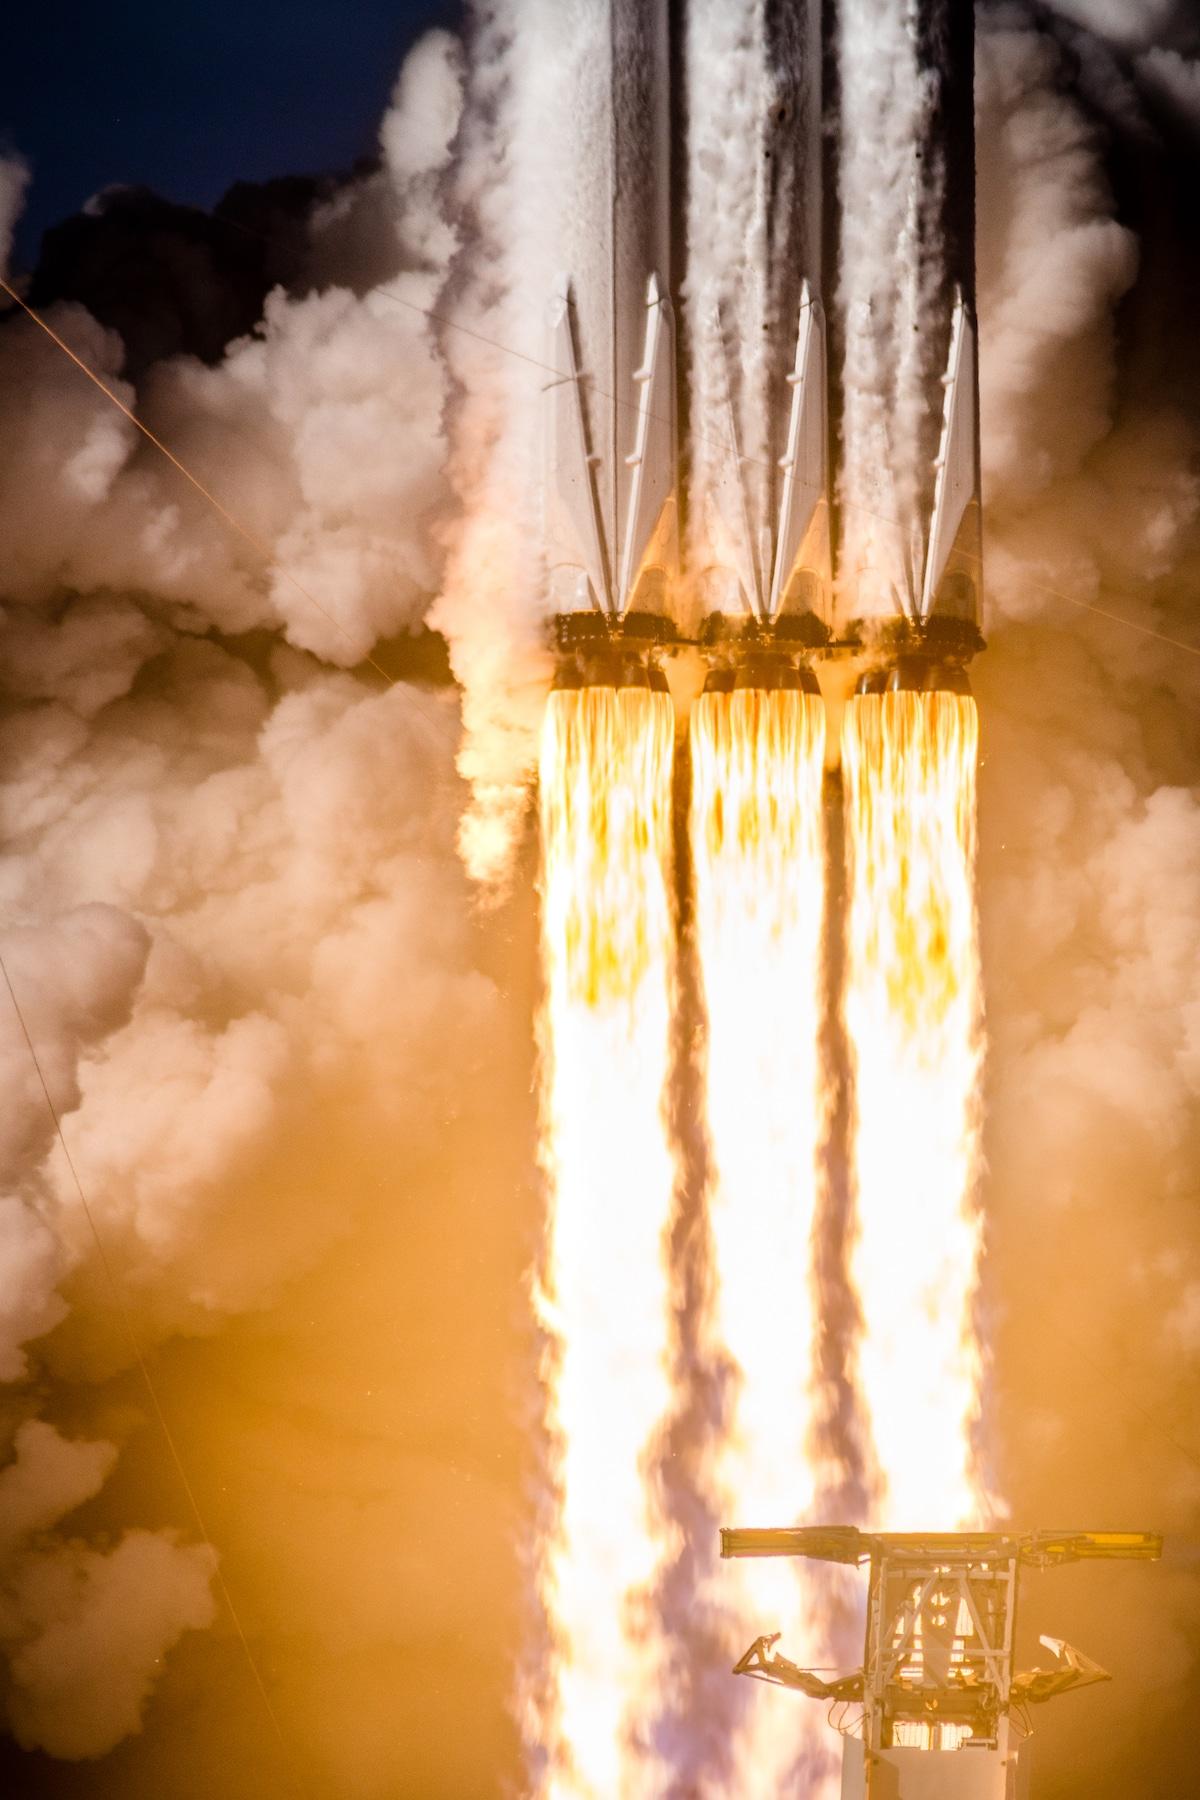 SpaceX Falcon Heavy Launch by Brady Kenniston